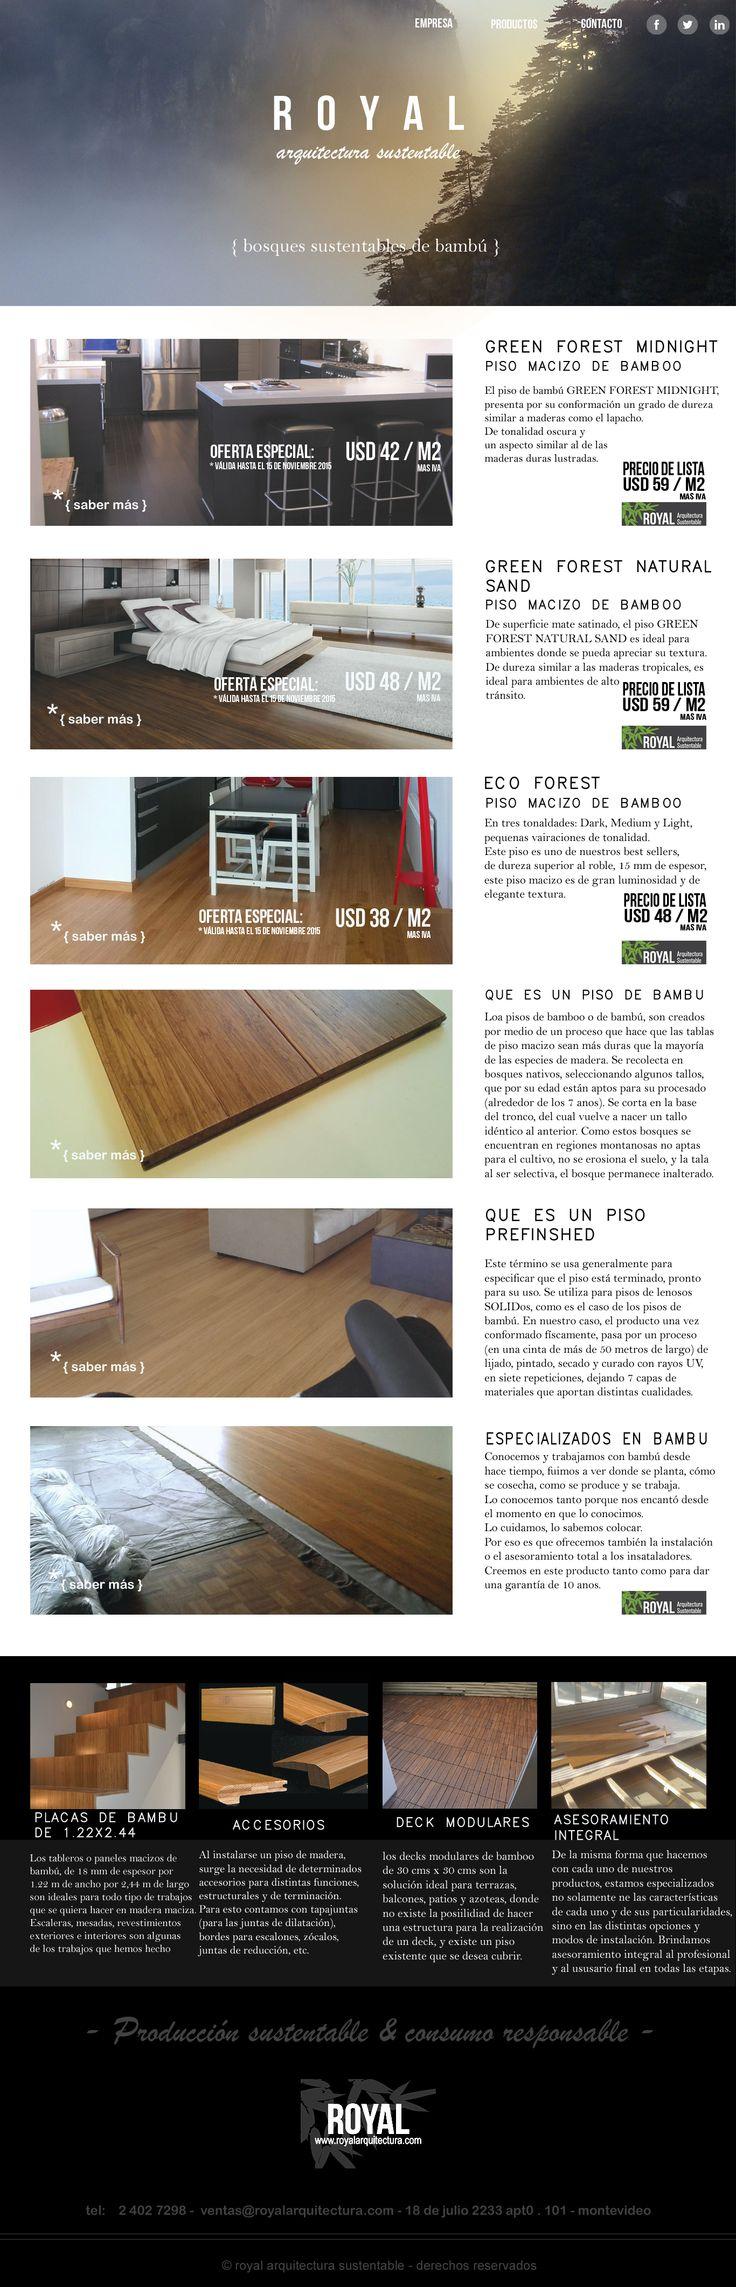 Bamboo Flooring / Pisos de Bambú. Newsletter   Royal arquitectura sustentable.